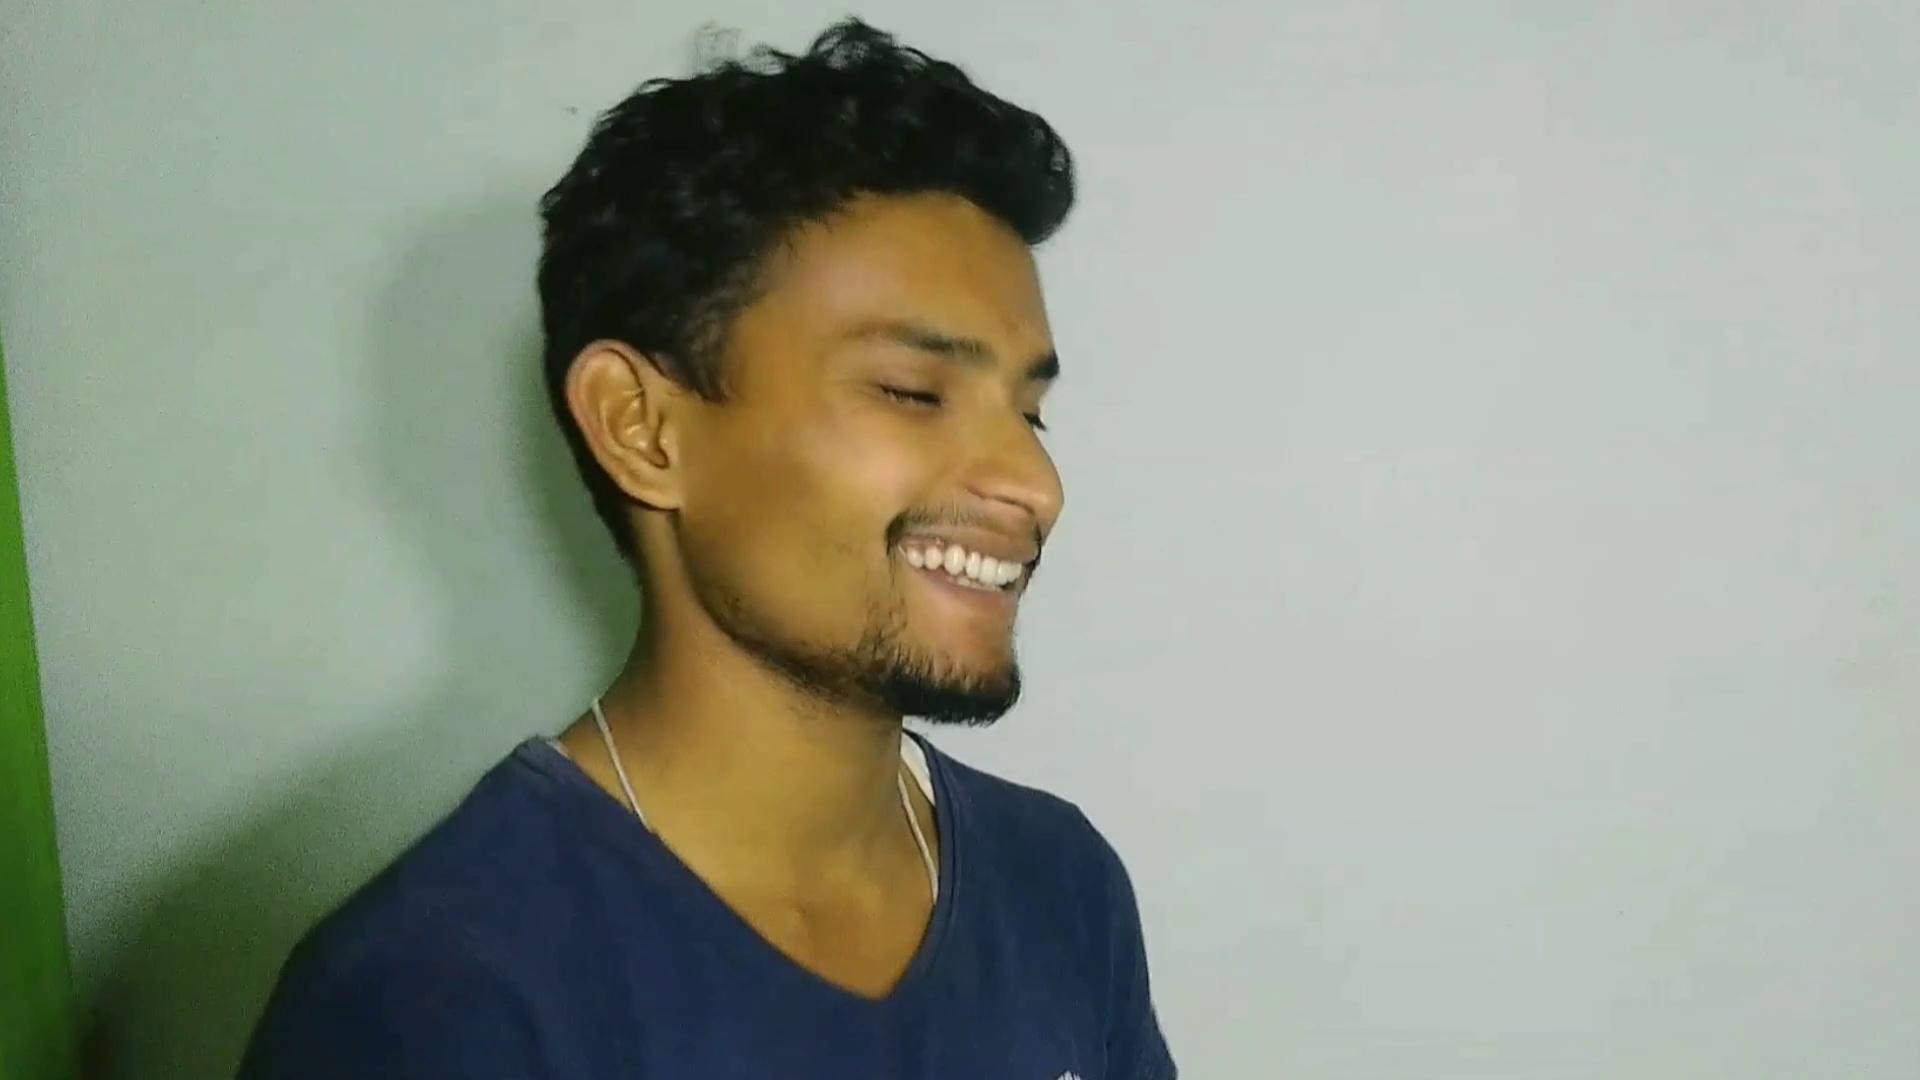 Chhattisgarhi Yoga Class    Chhattisgarhi Comedy Video New    Cg Comedy videos By tech fun   cg comedy    comedy video     cg comedy video